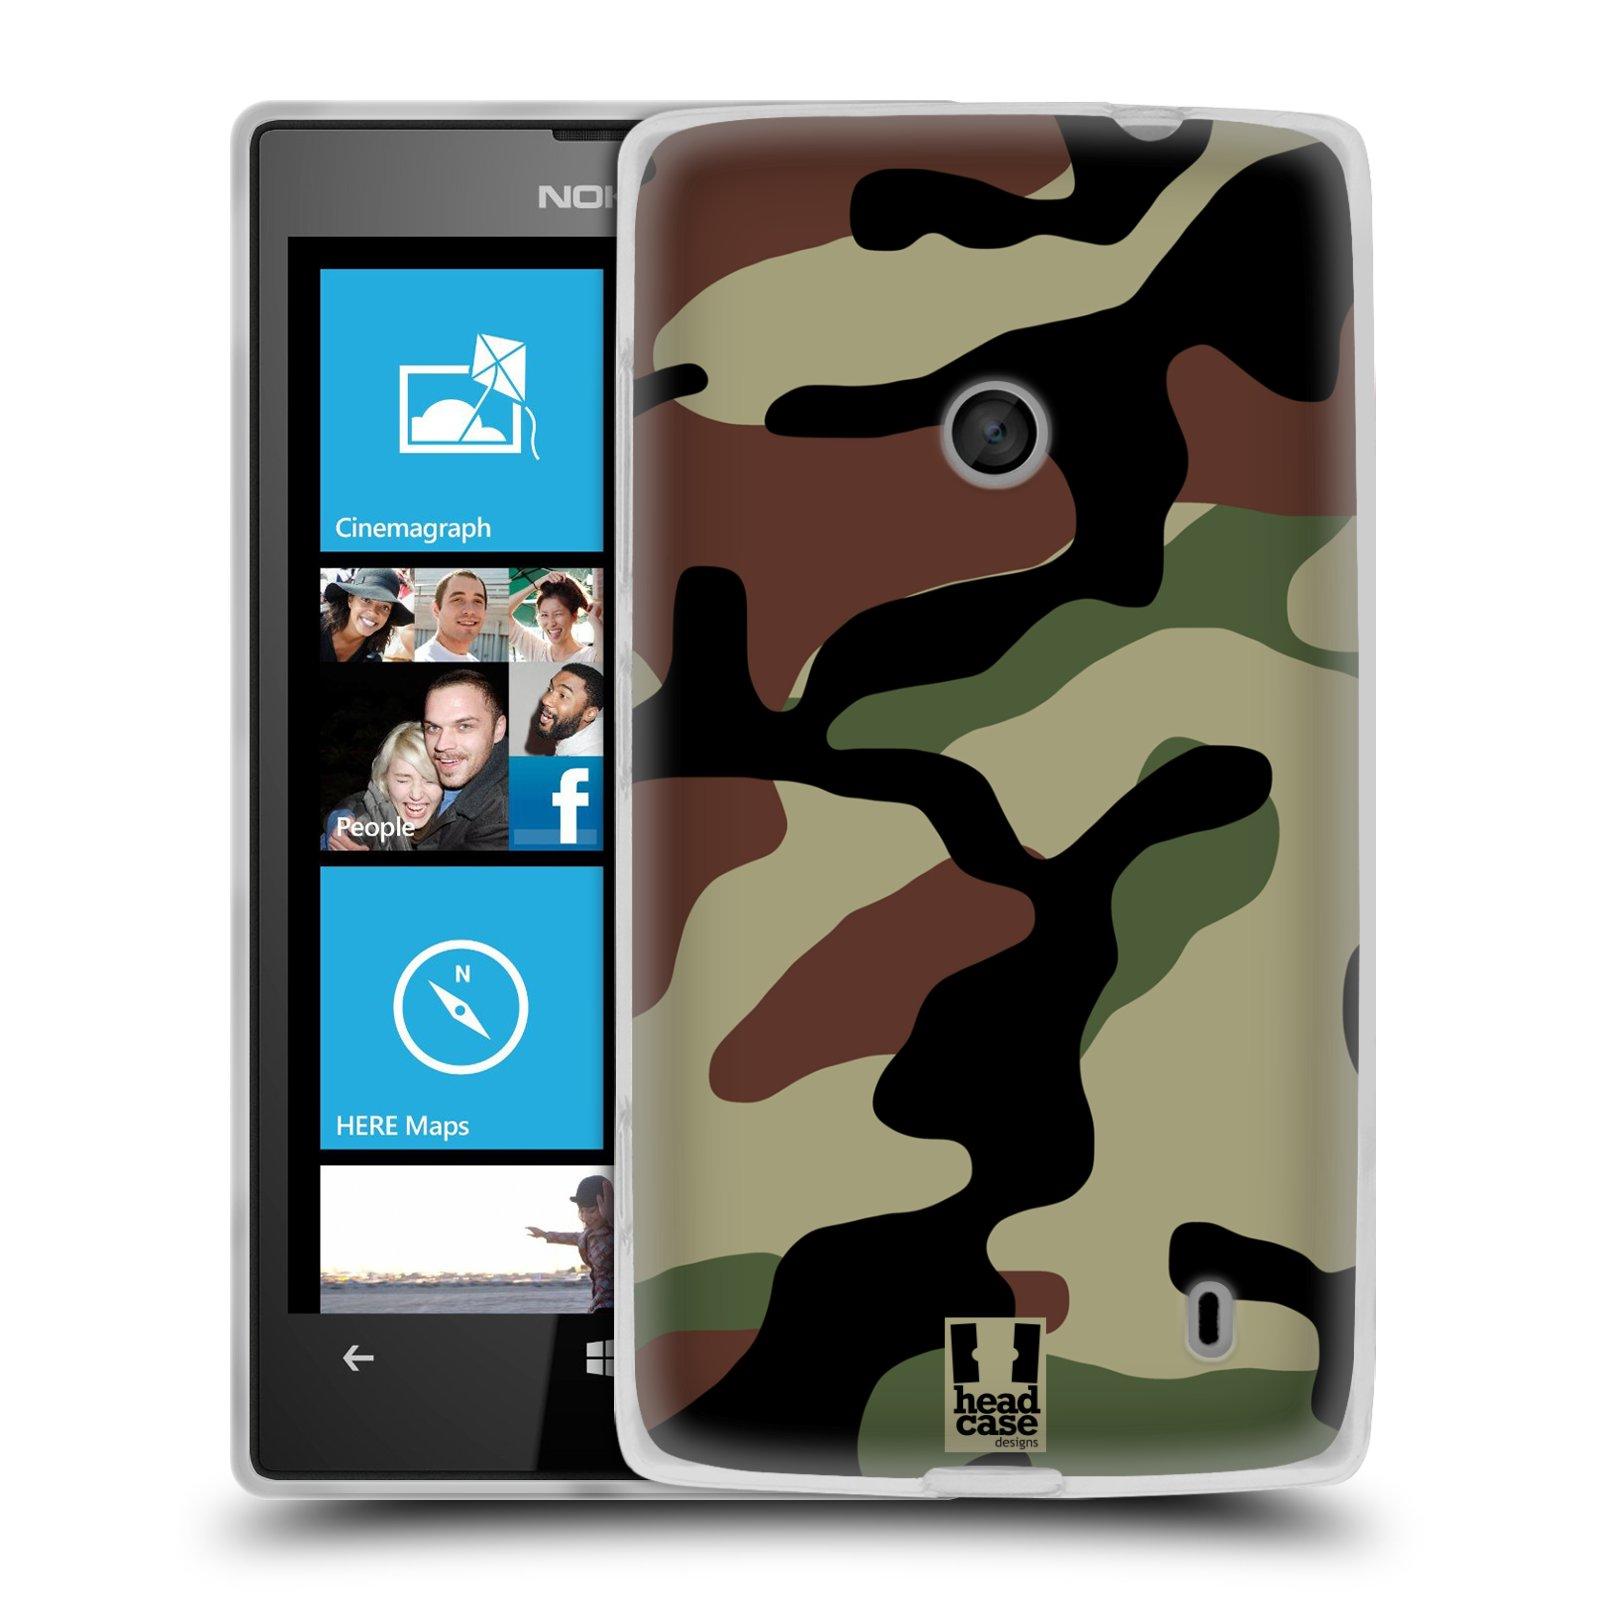 Silikonové pouzdro na mobil Nokia Lumia 520 HEAD CASE Maskáče (Silikonový Kryt či obal na mobilní telefon Nokia Lumia 520)